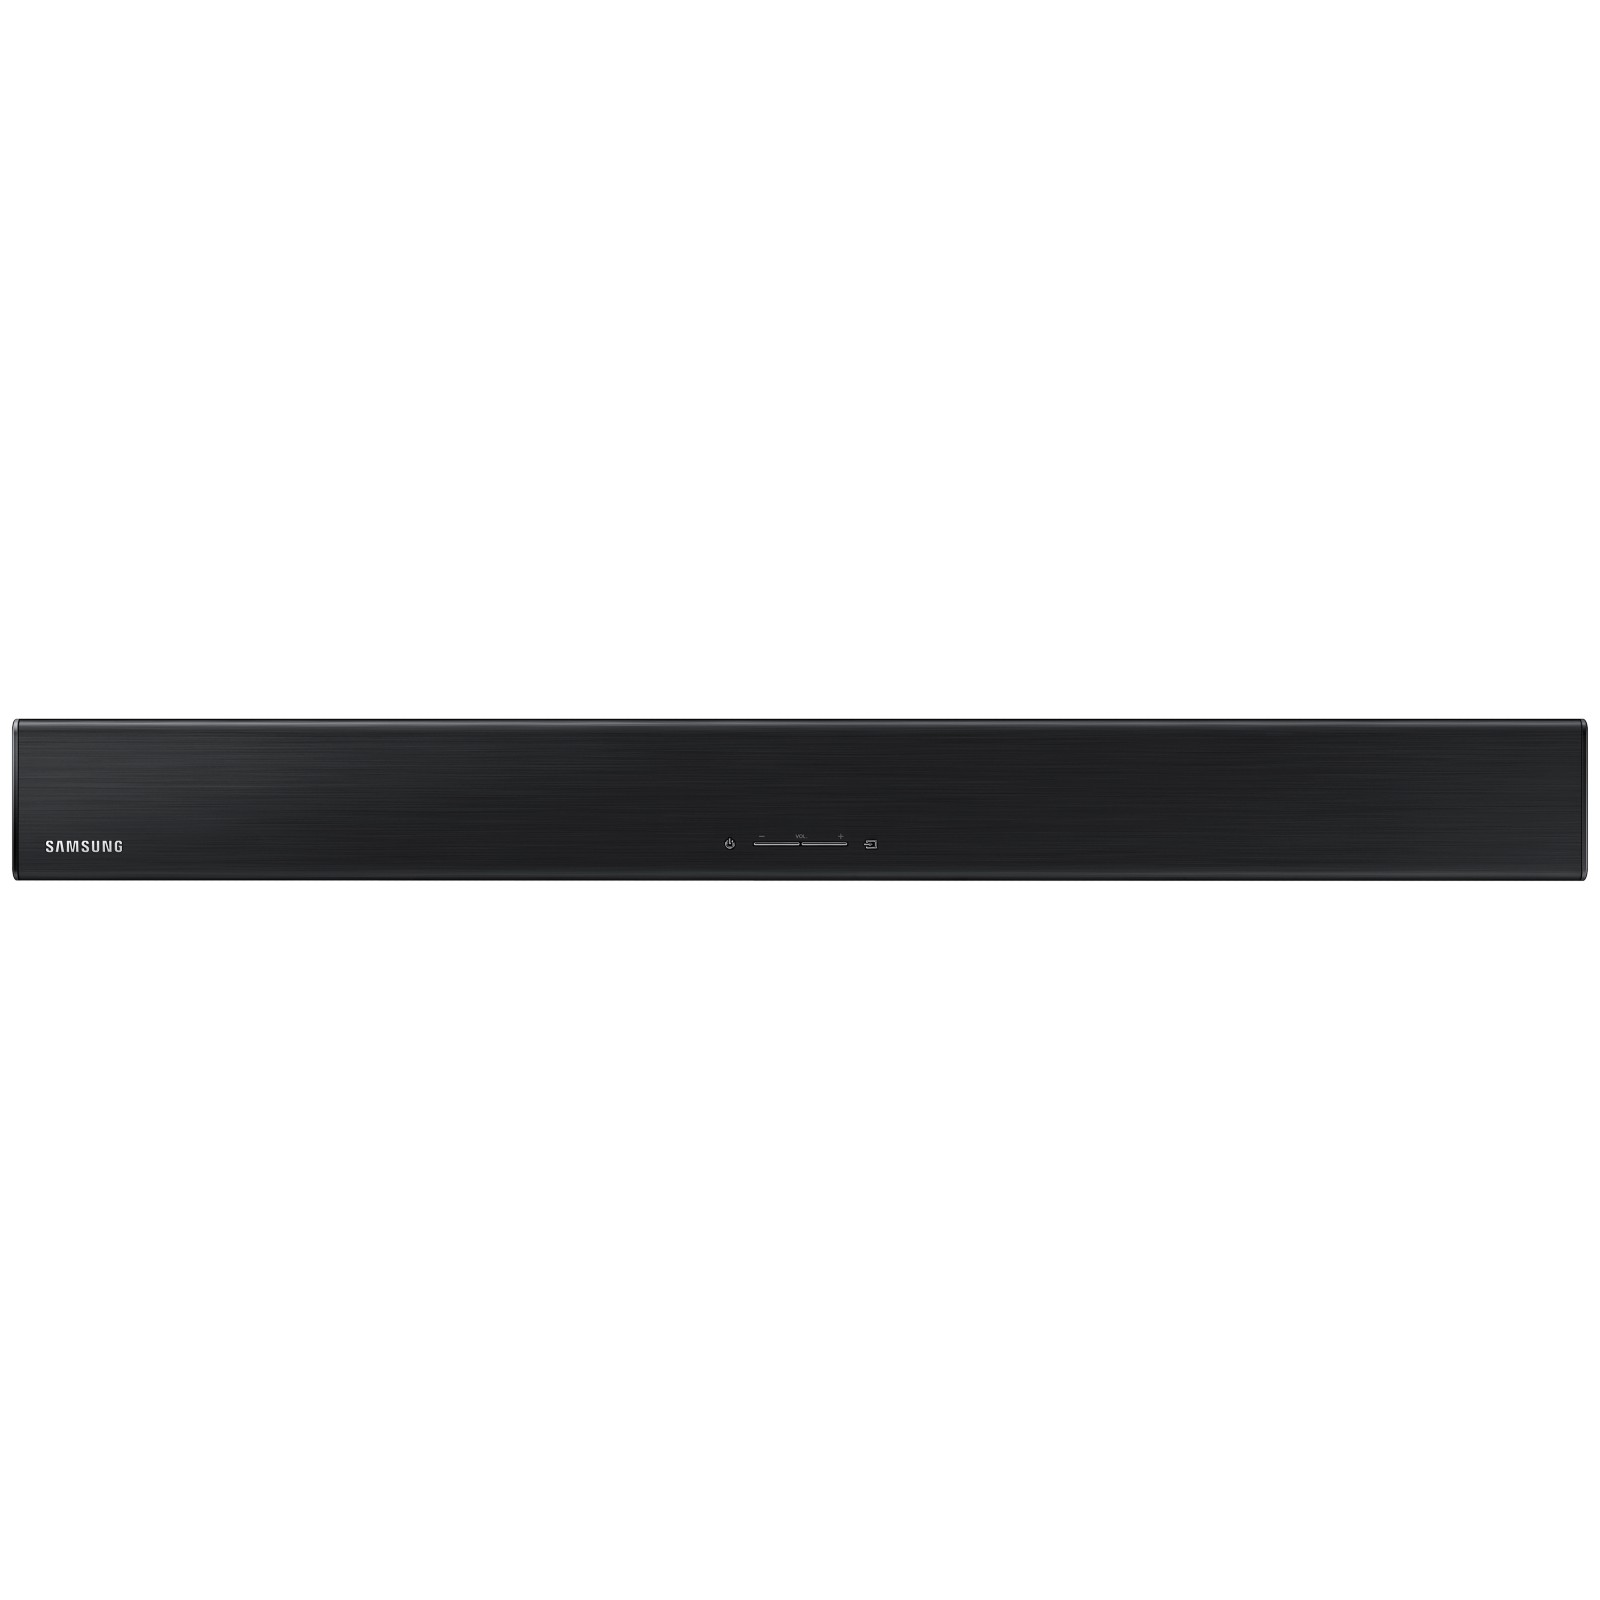 Samsung HW-J250 Wireless Bluetooth Sound Bar